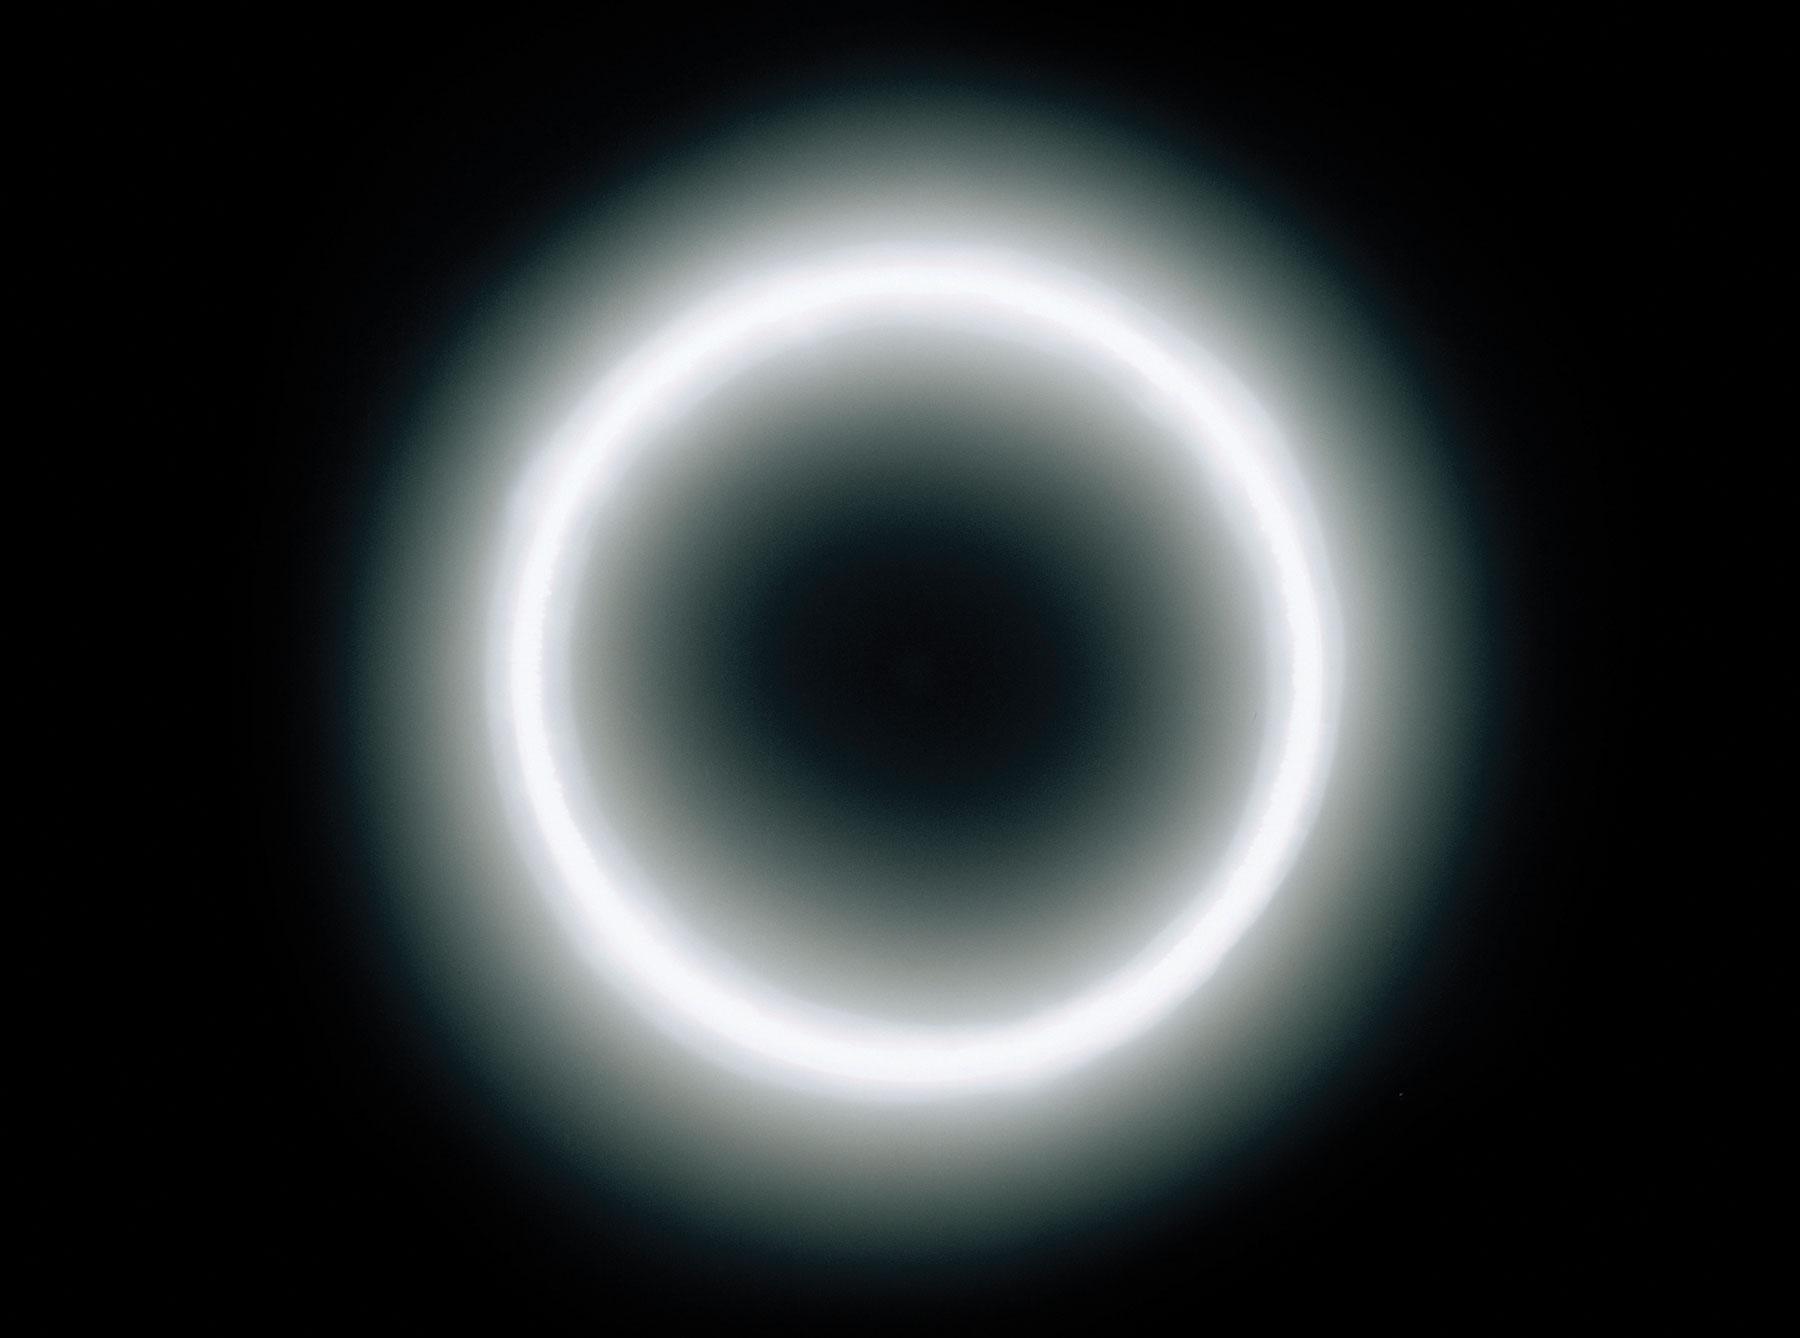 Ring of light in dark background